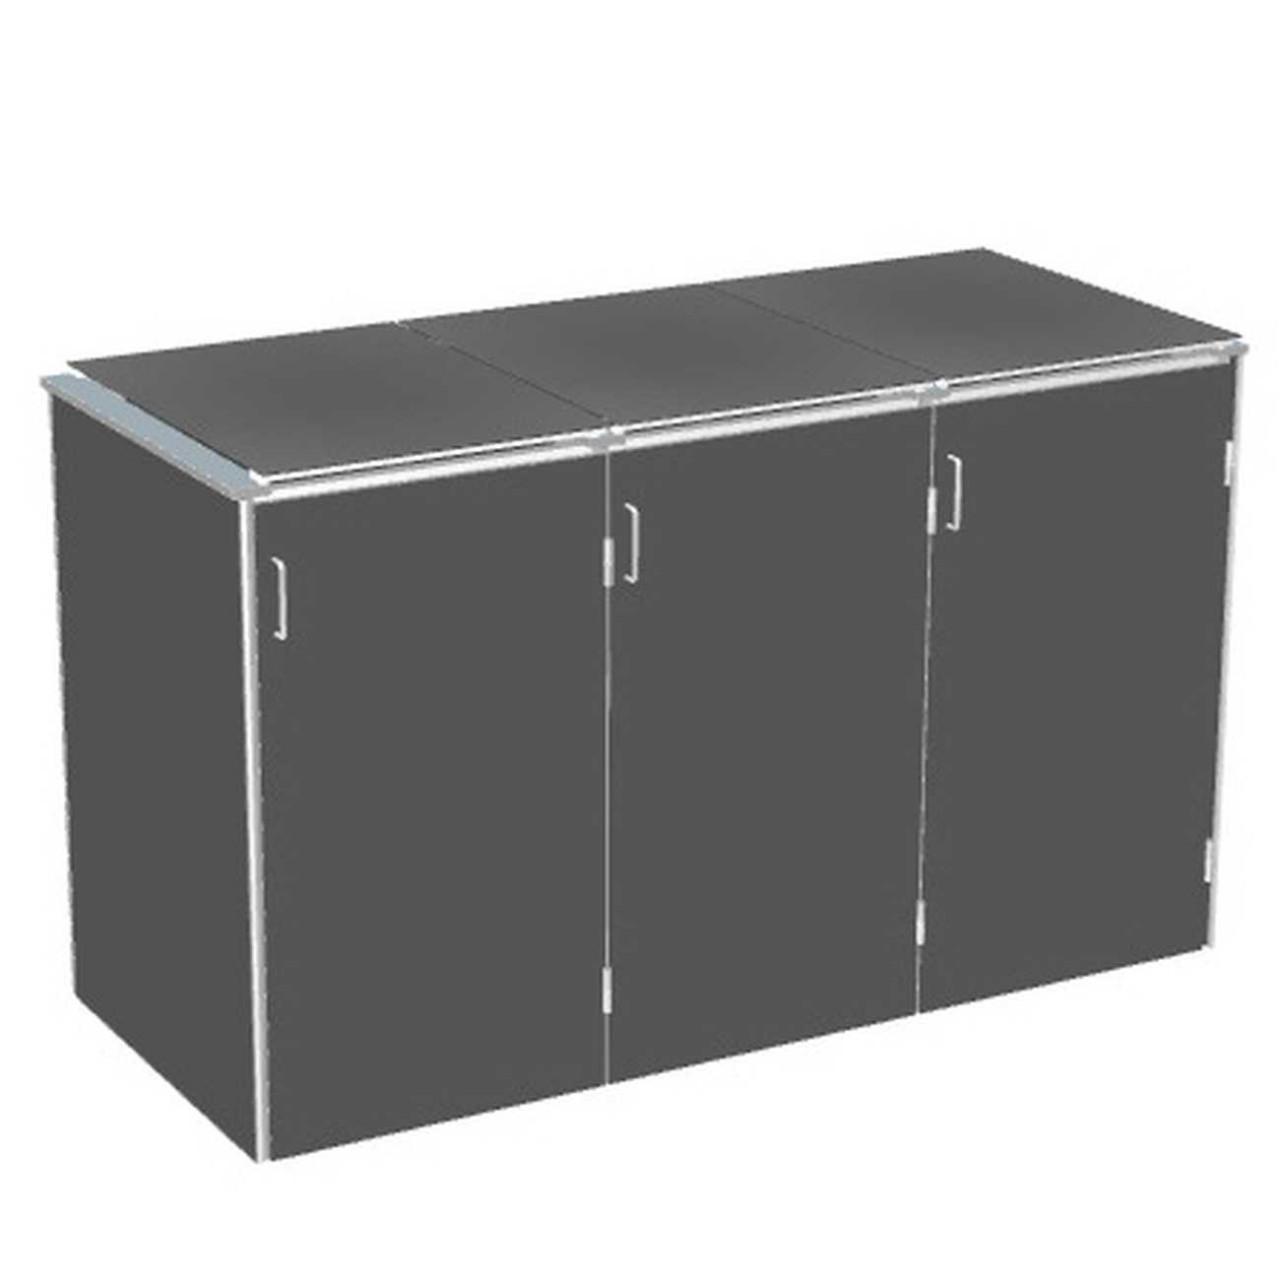 Binto Mülltonnenbox HPL Schiefer mit HPL-Klappdeckel